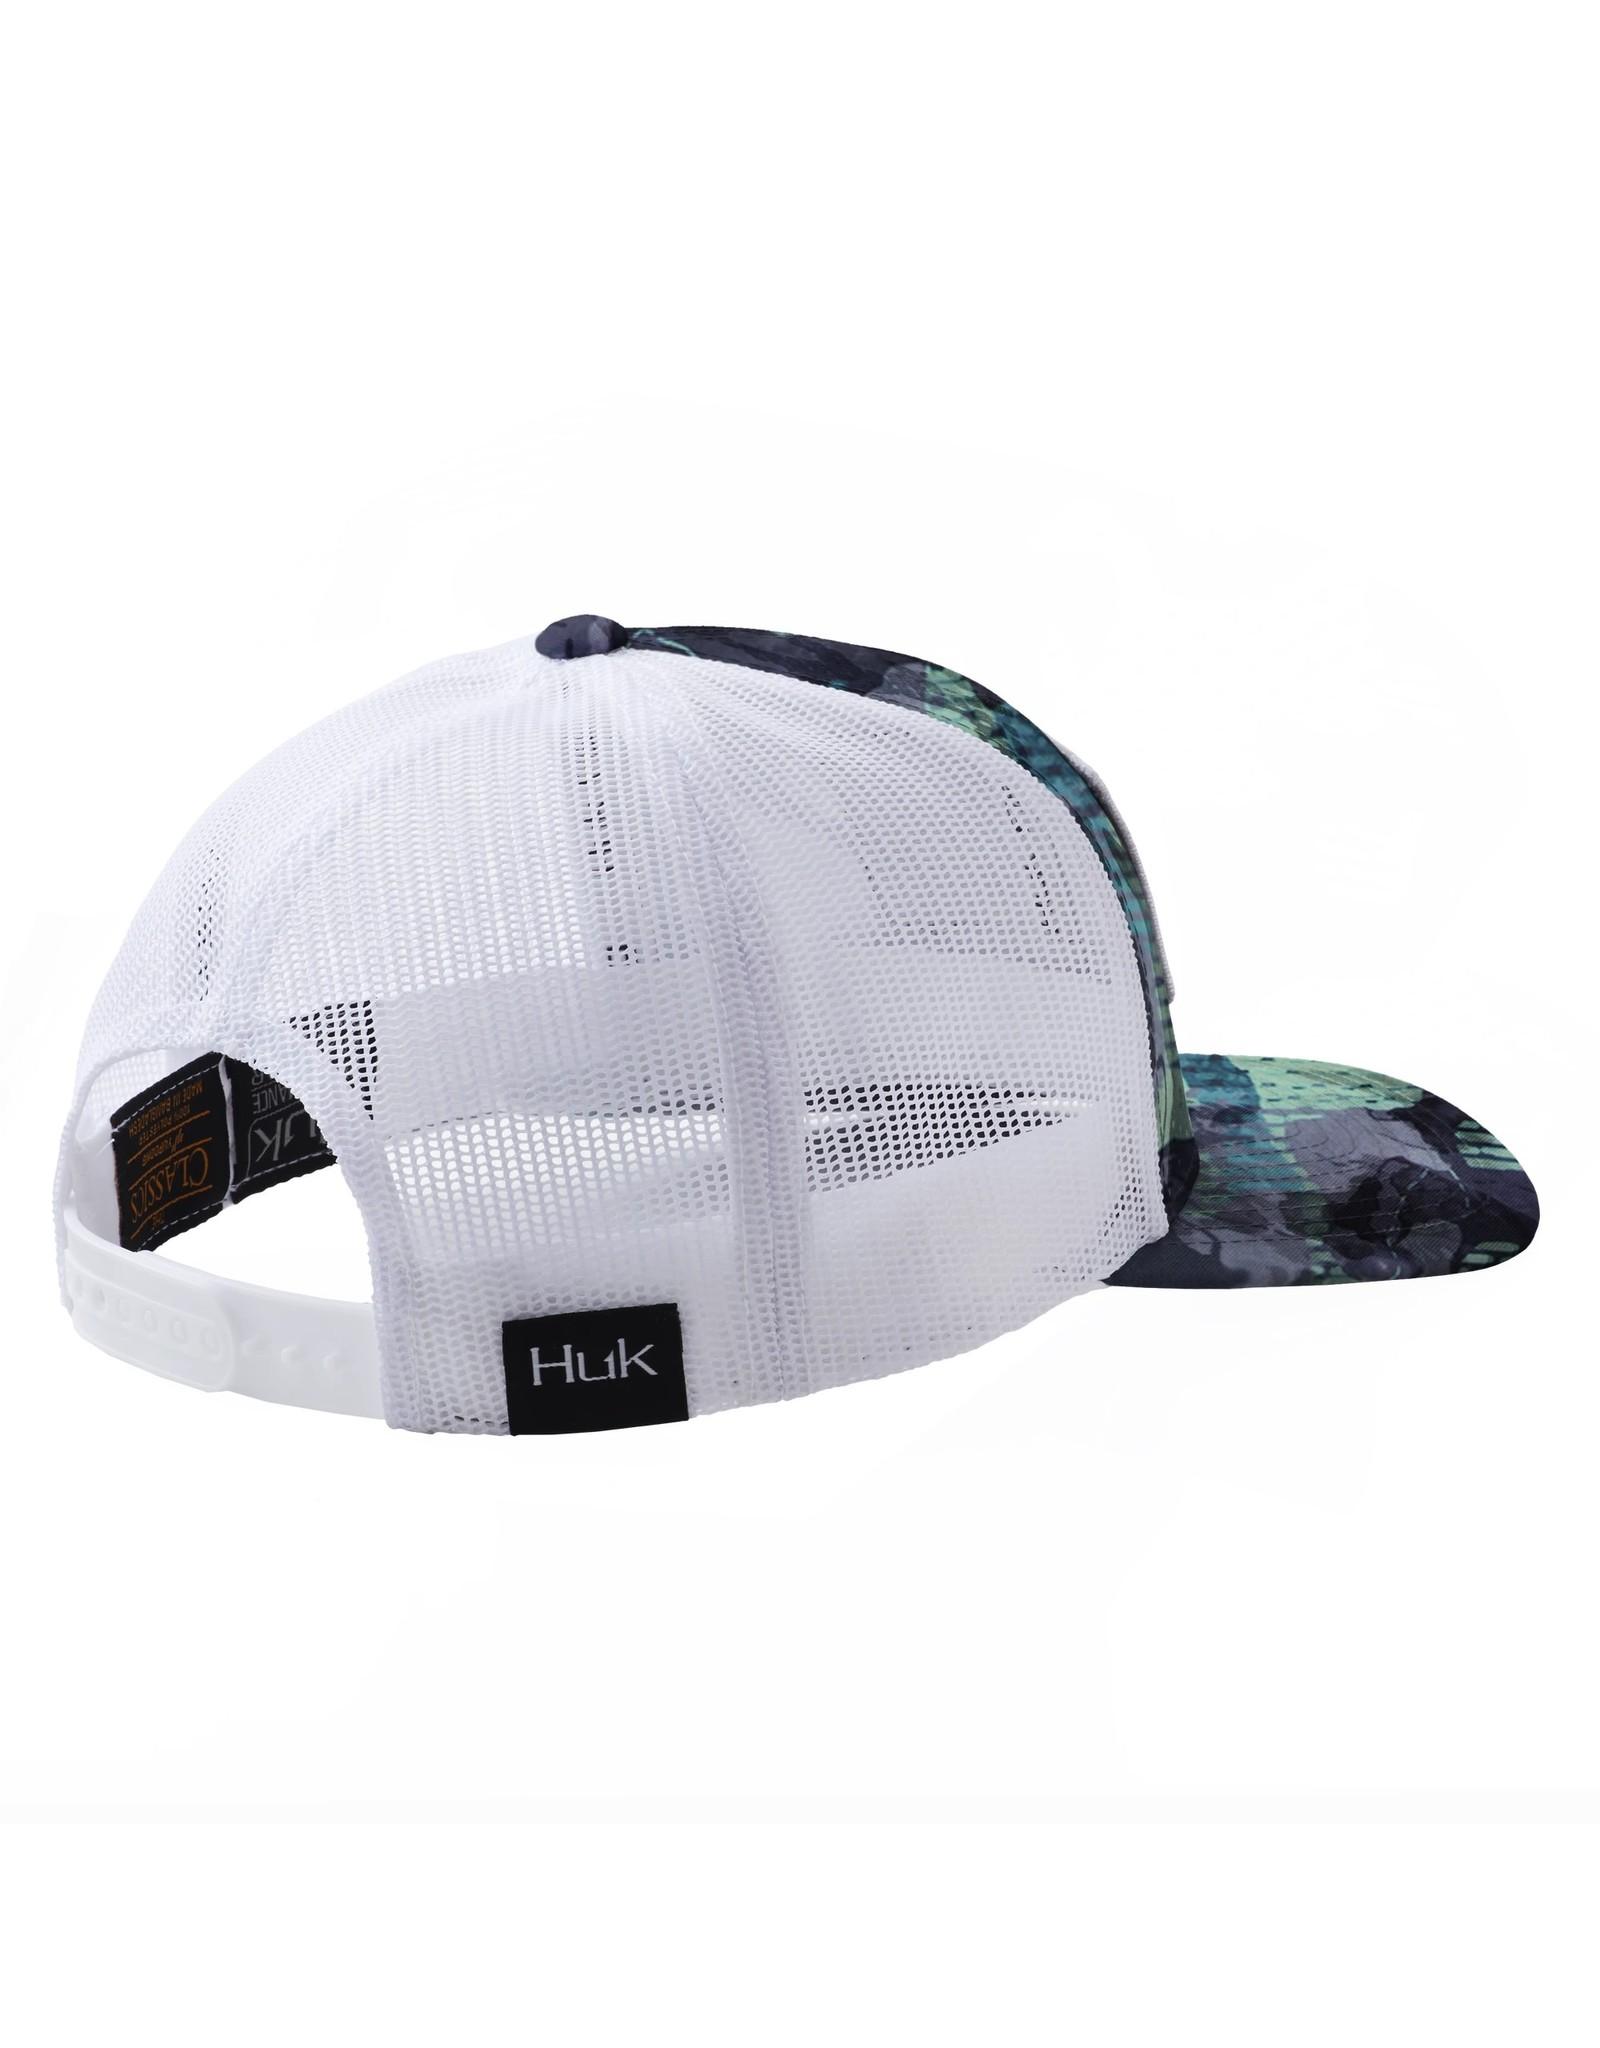 Huk Gear Huk'd Up Refraction Hat